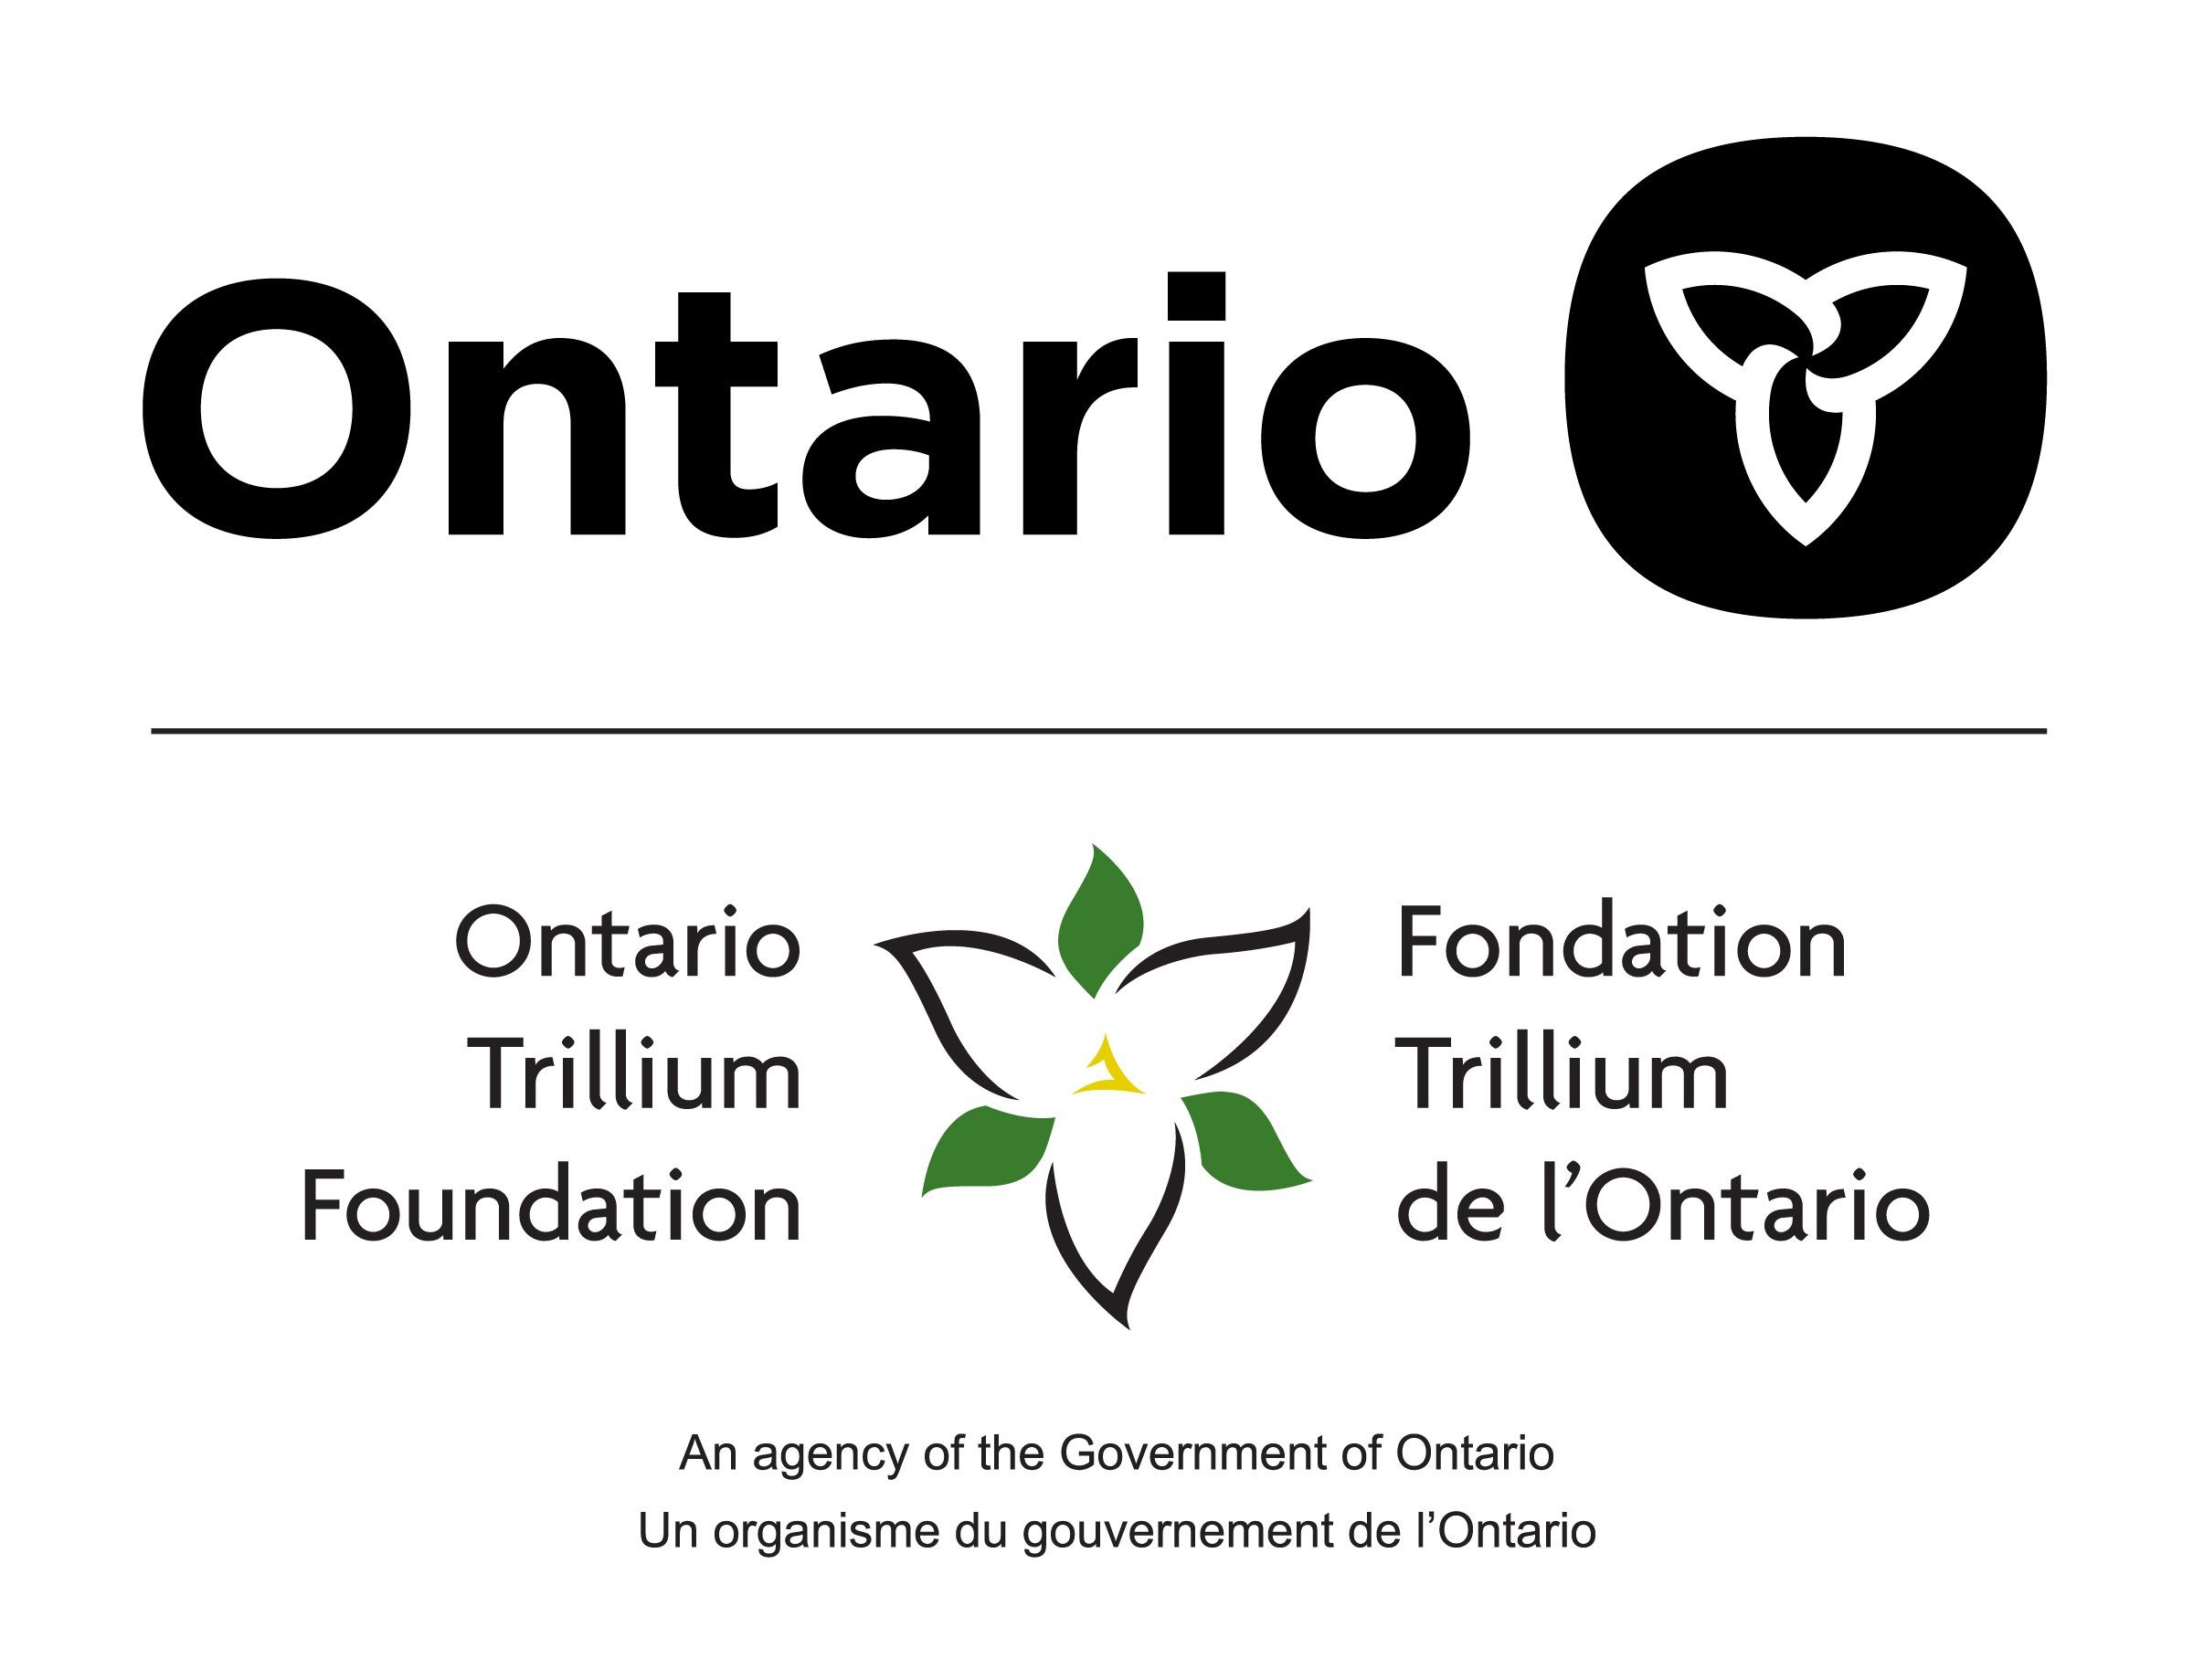 Ontario and Ontario Trillium Foundation logos